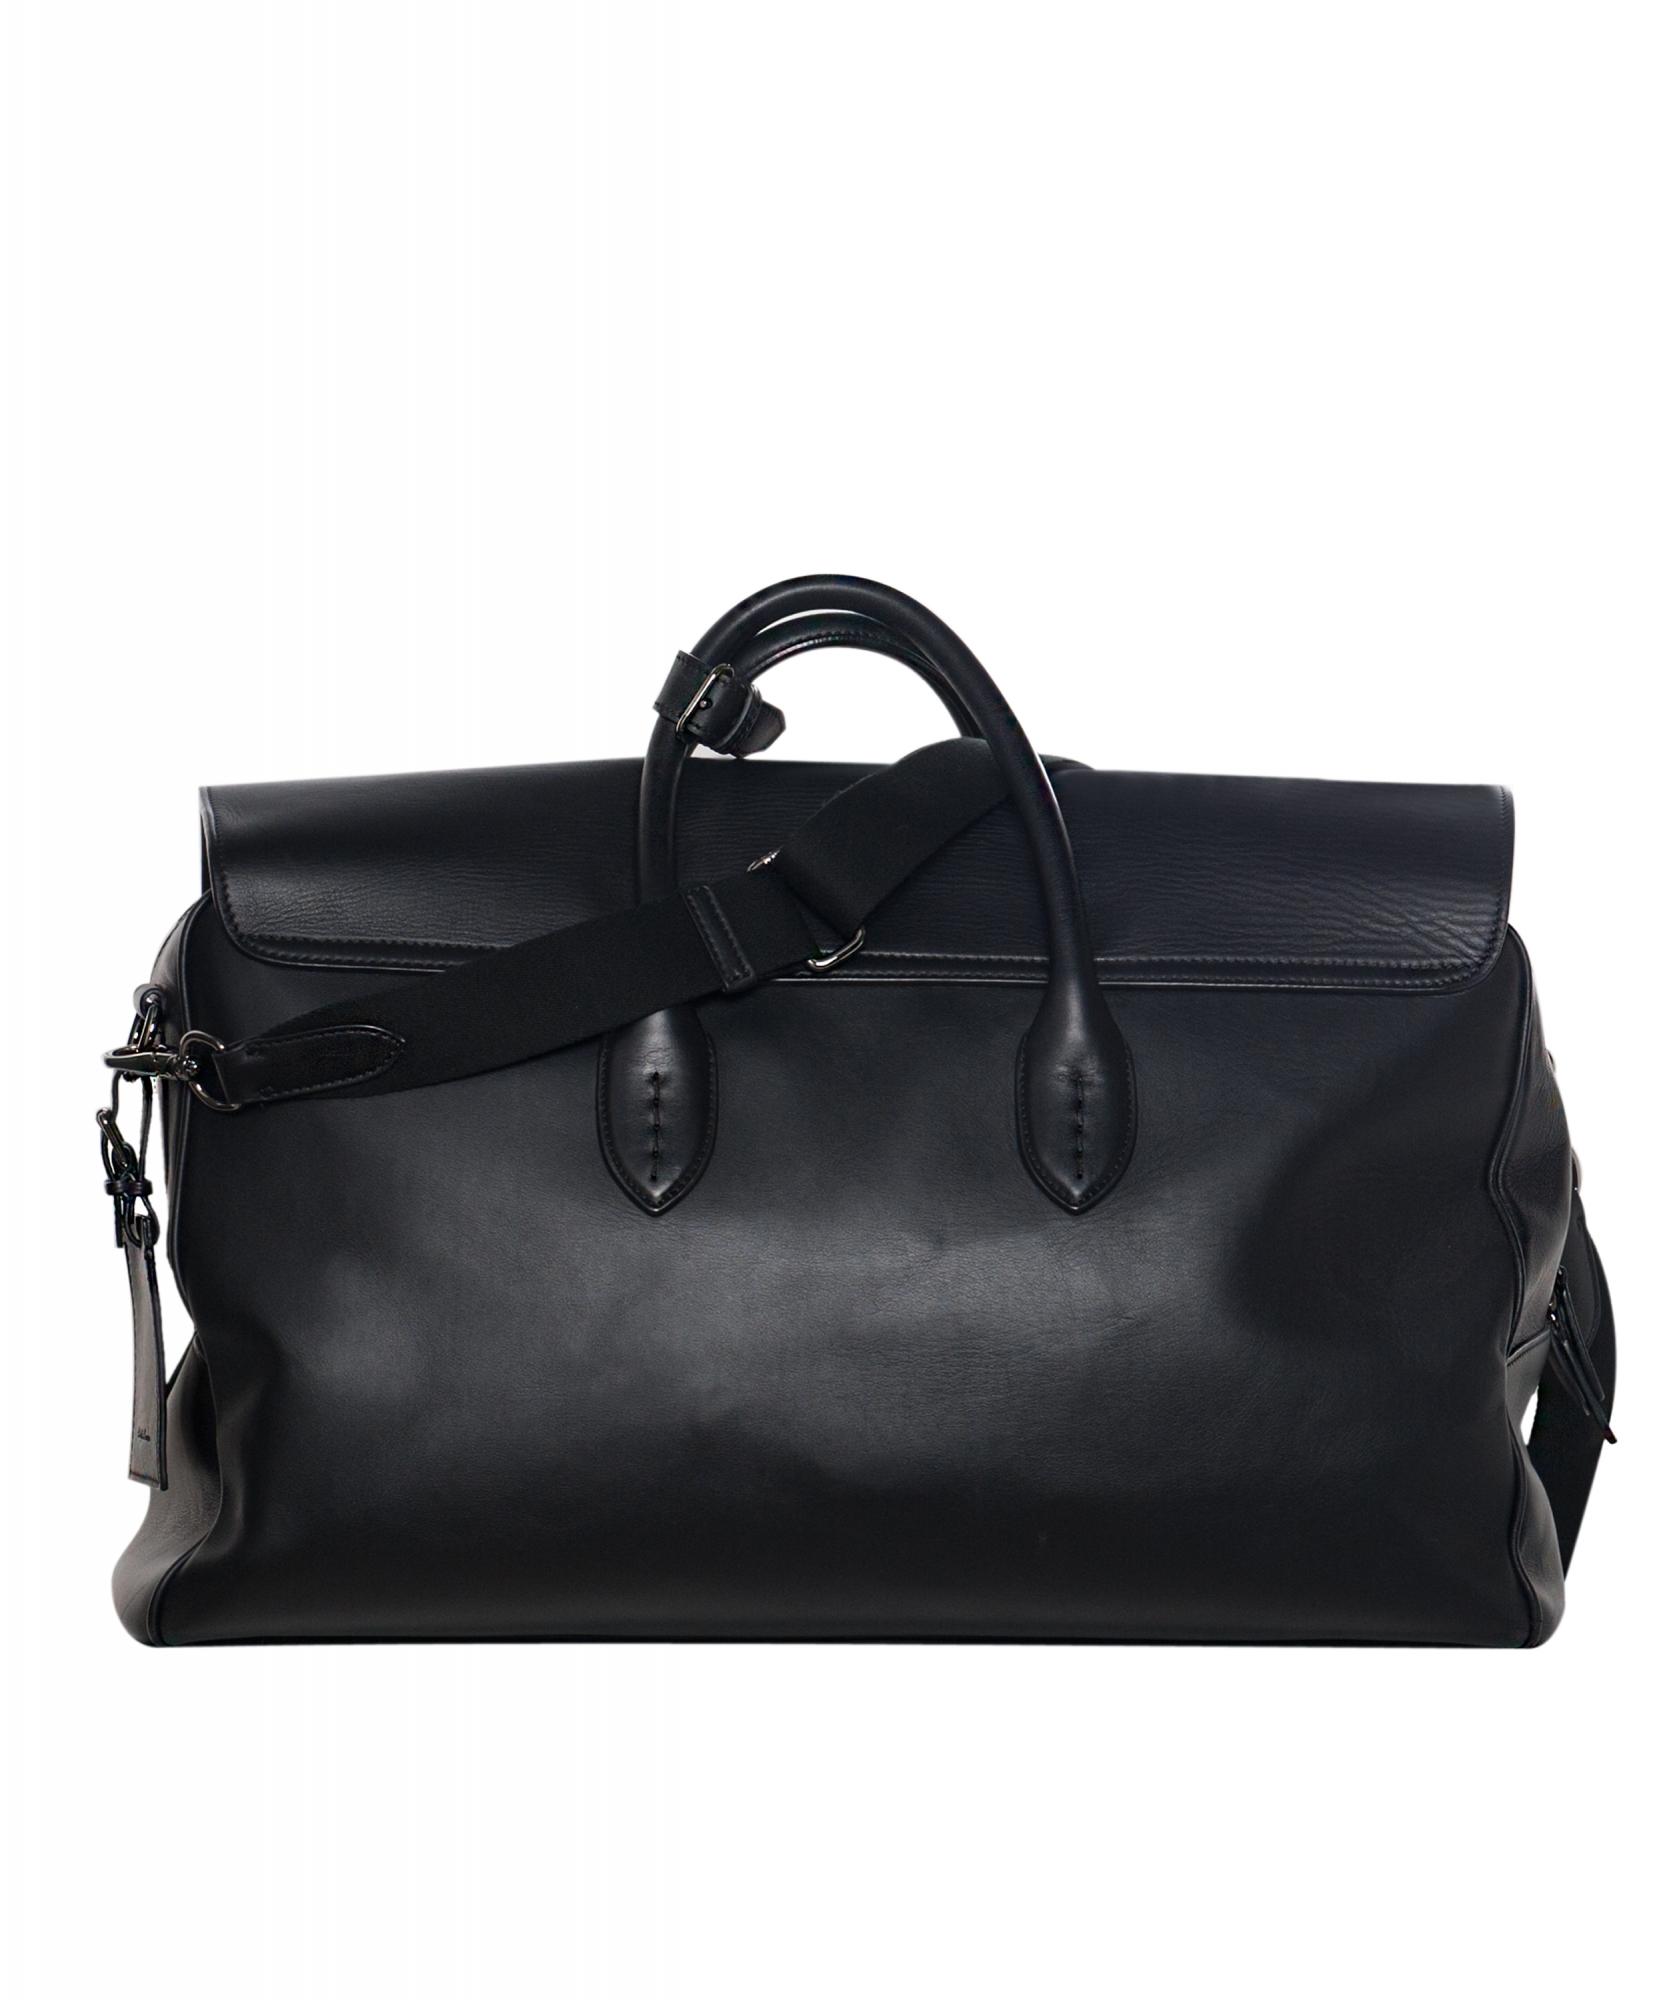 c8cca8ed05 Ralph Lauren Black Leather Cooper Bag